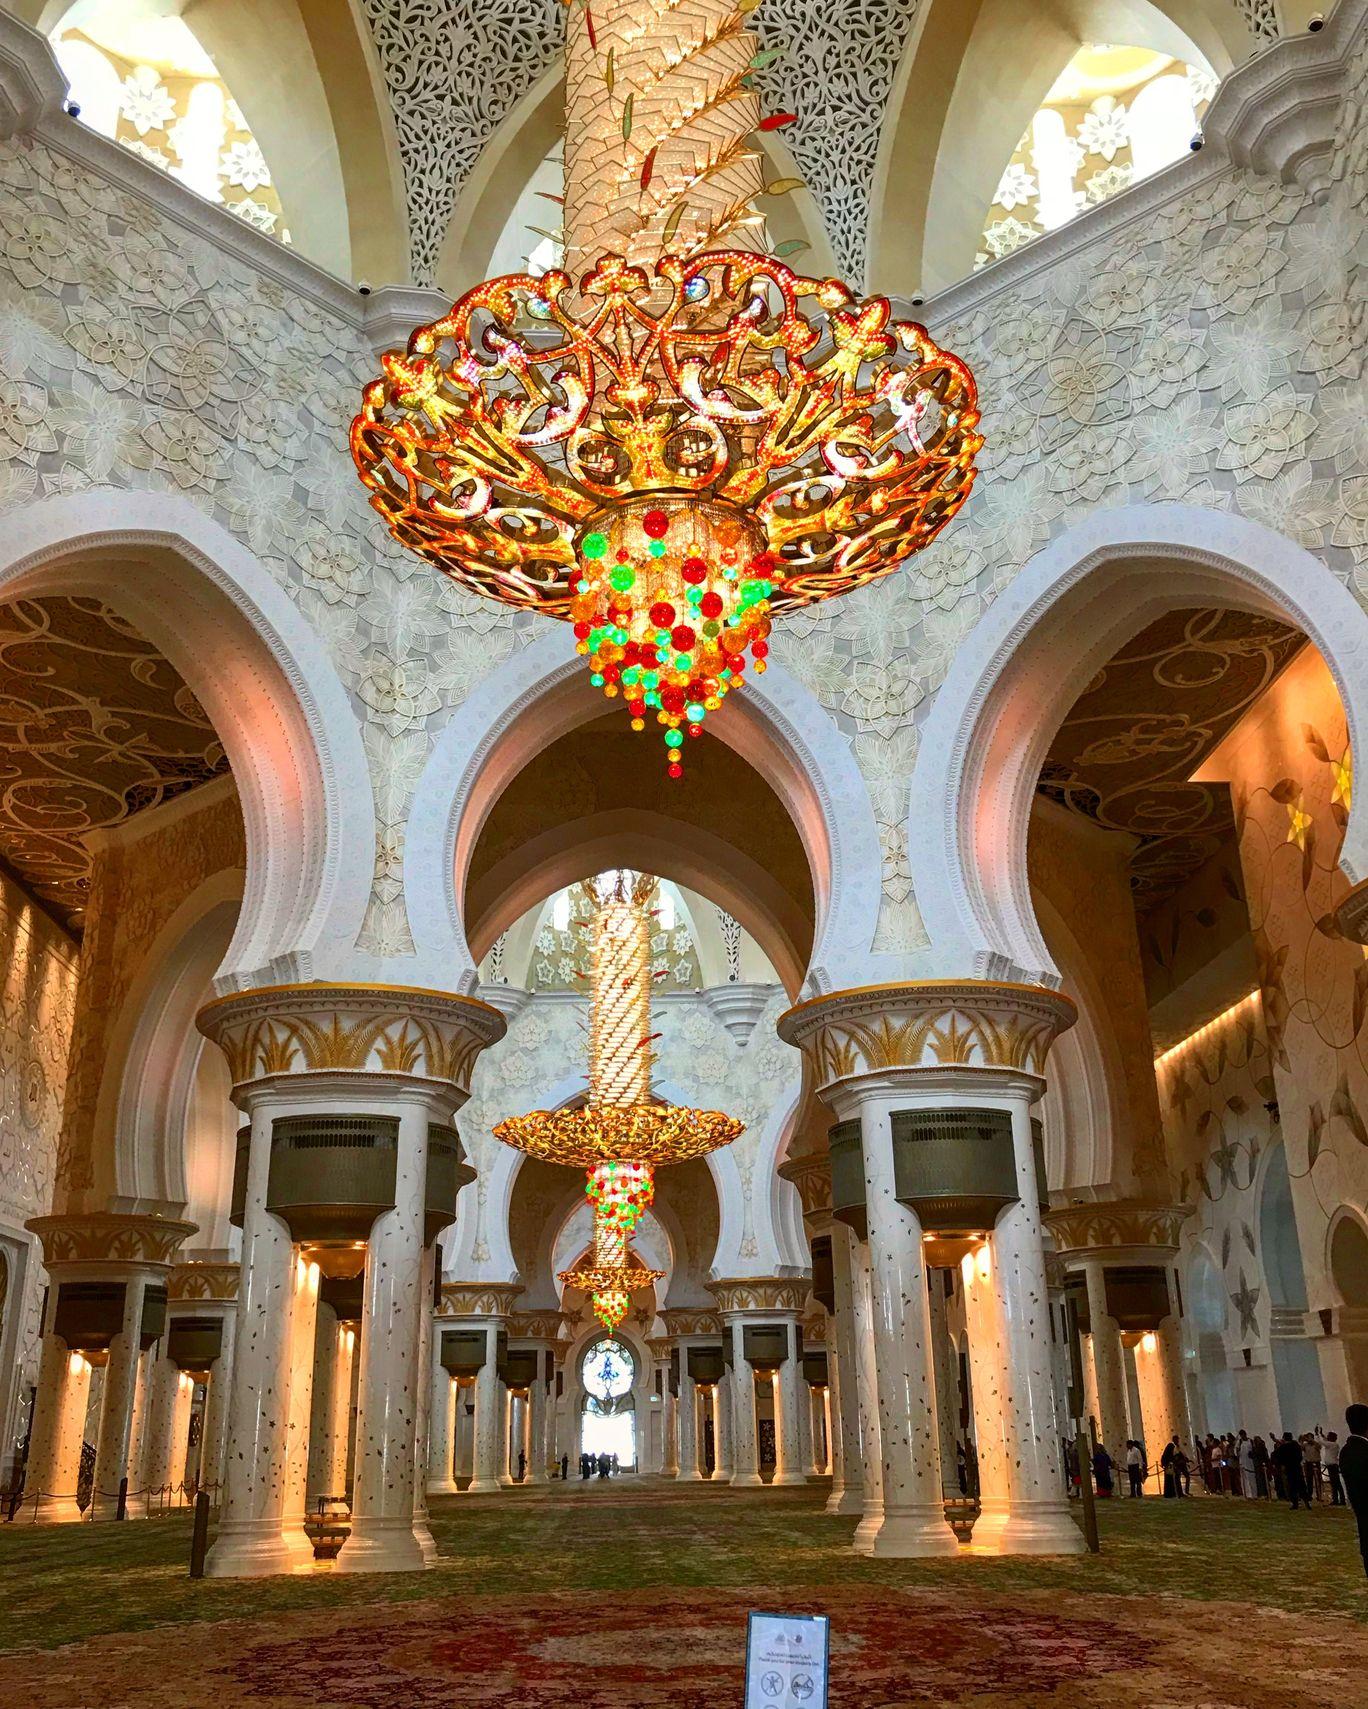 Photo of Sheikh Zayed Grand Mosque Center - Abu Dhabi - United Arab Emirates By Kavitha Ananthan